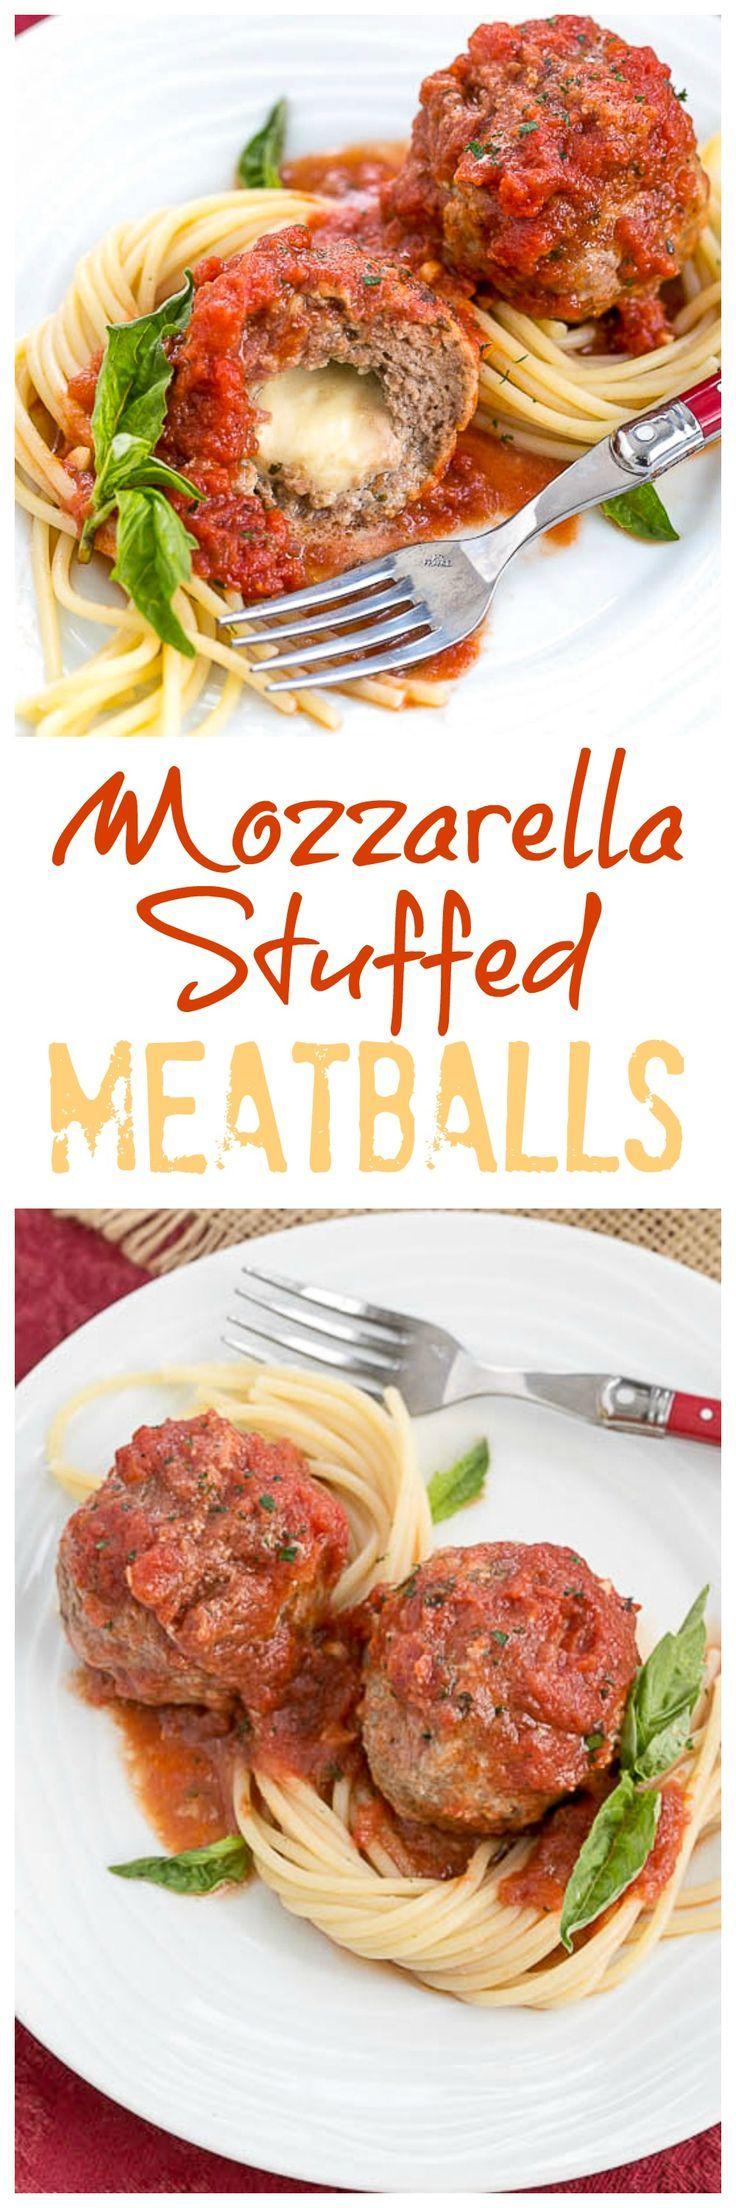 Mozzarella Stuffed Meatballs | Tender meatballs filled with gooey mozzarella